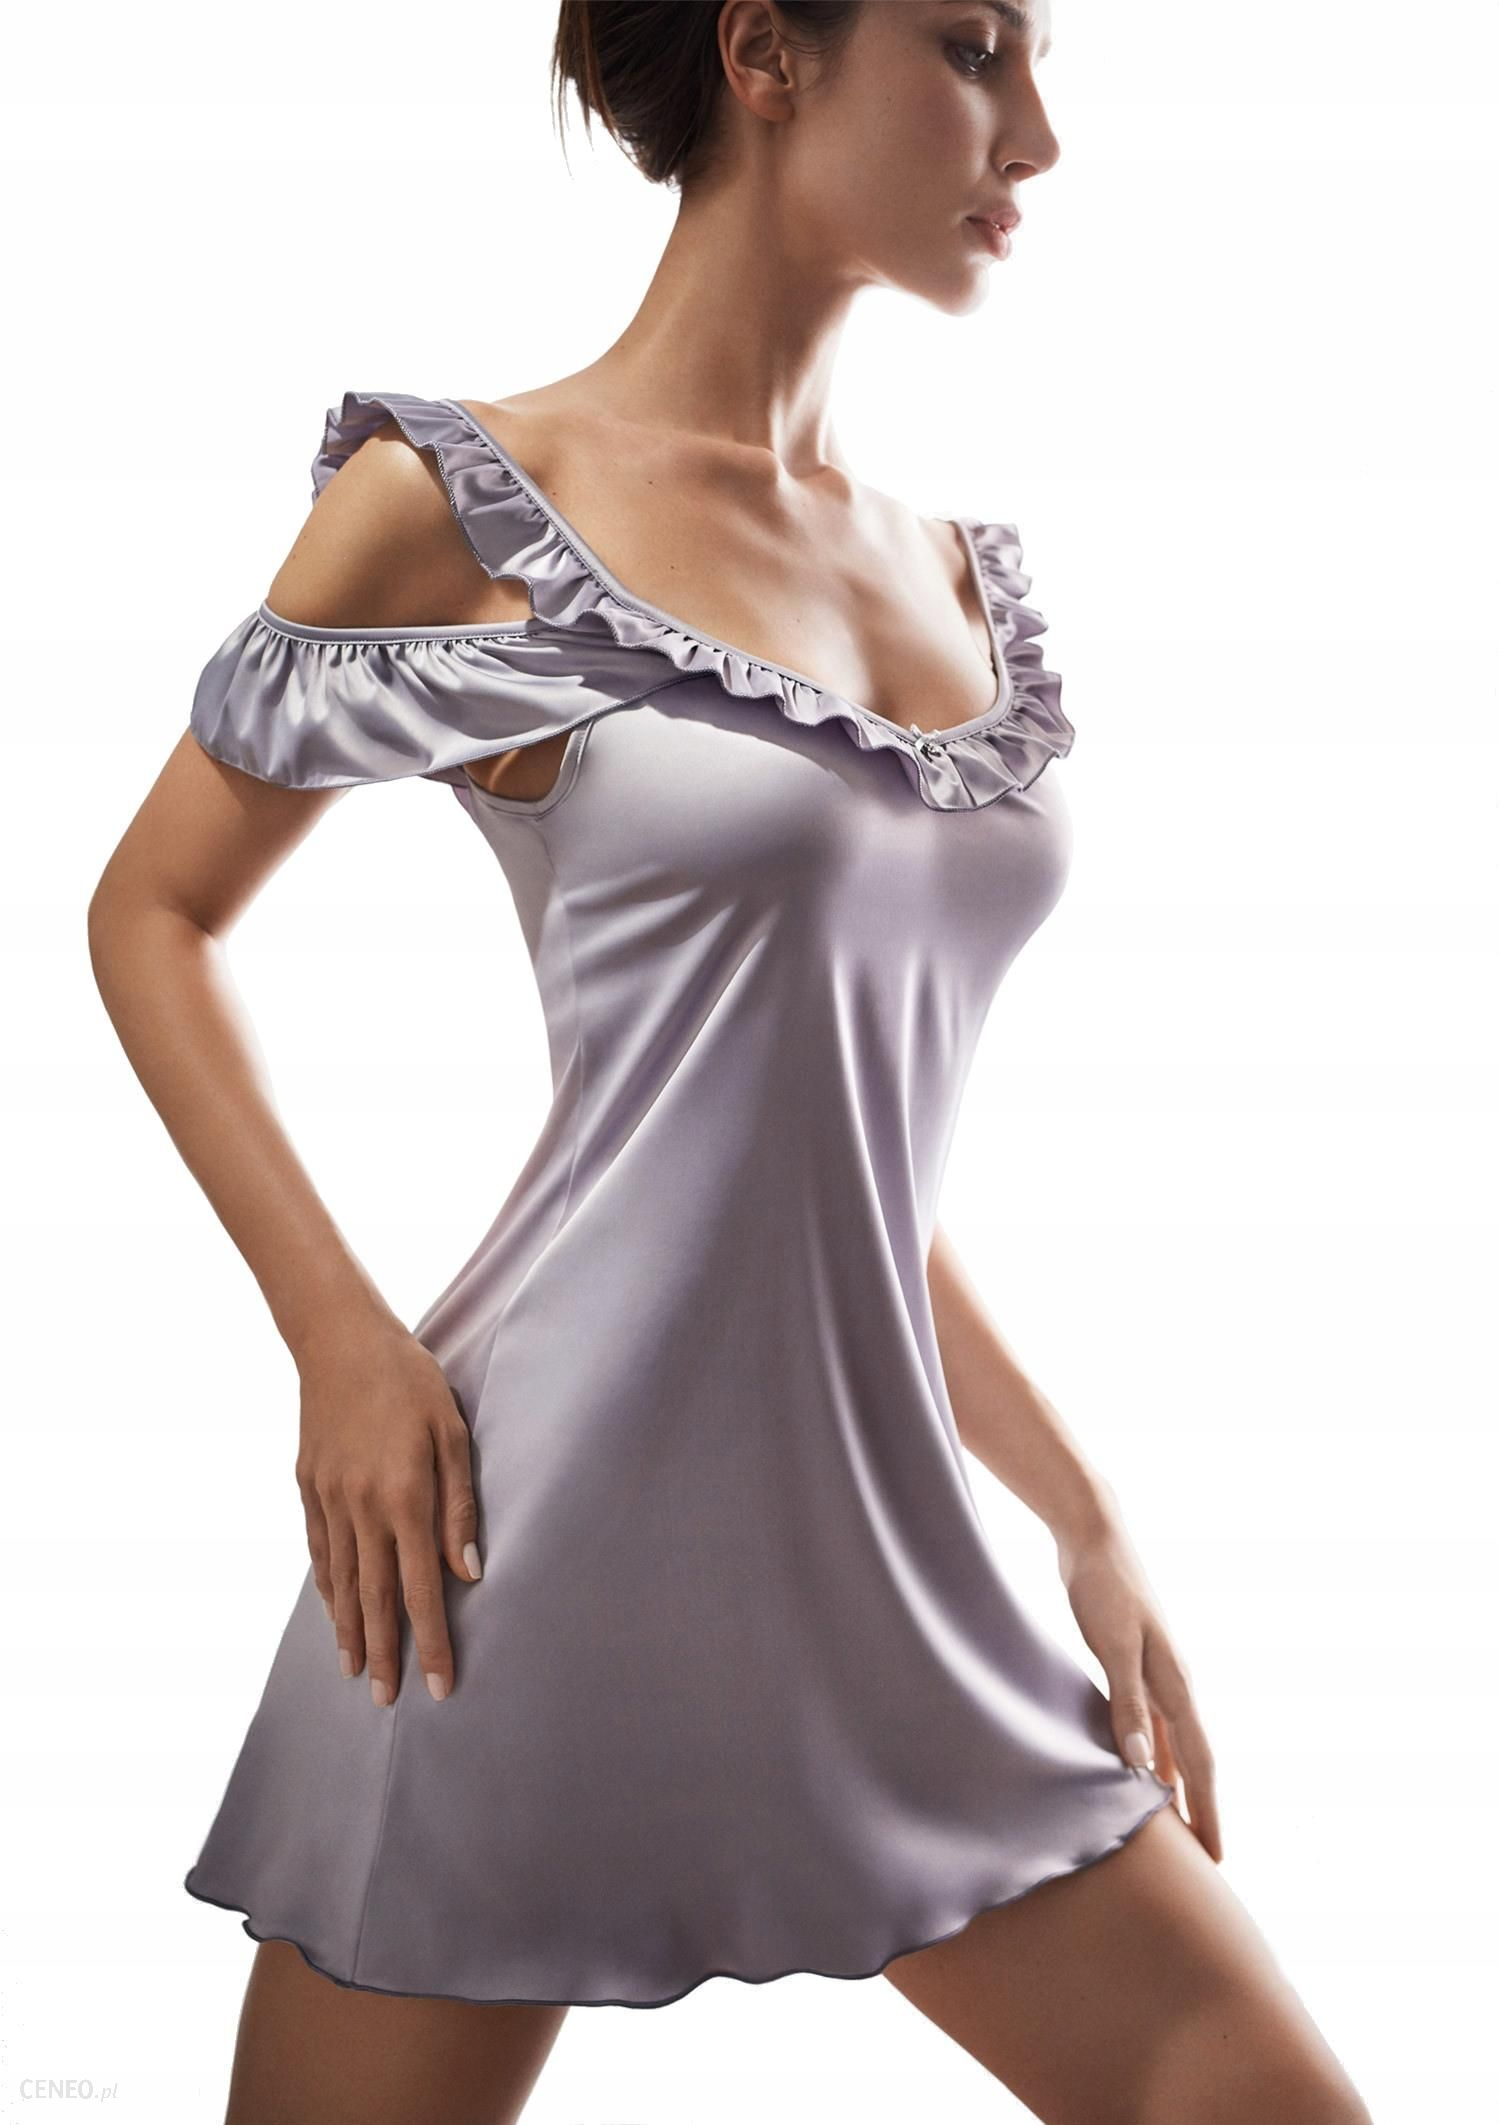 37a6da266f17ec Marilyn Poupee koszulka nocna Corazon Silver 38 - Ceny i opinie ...